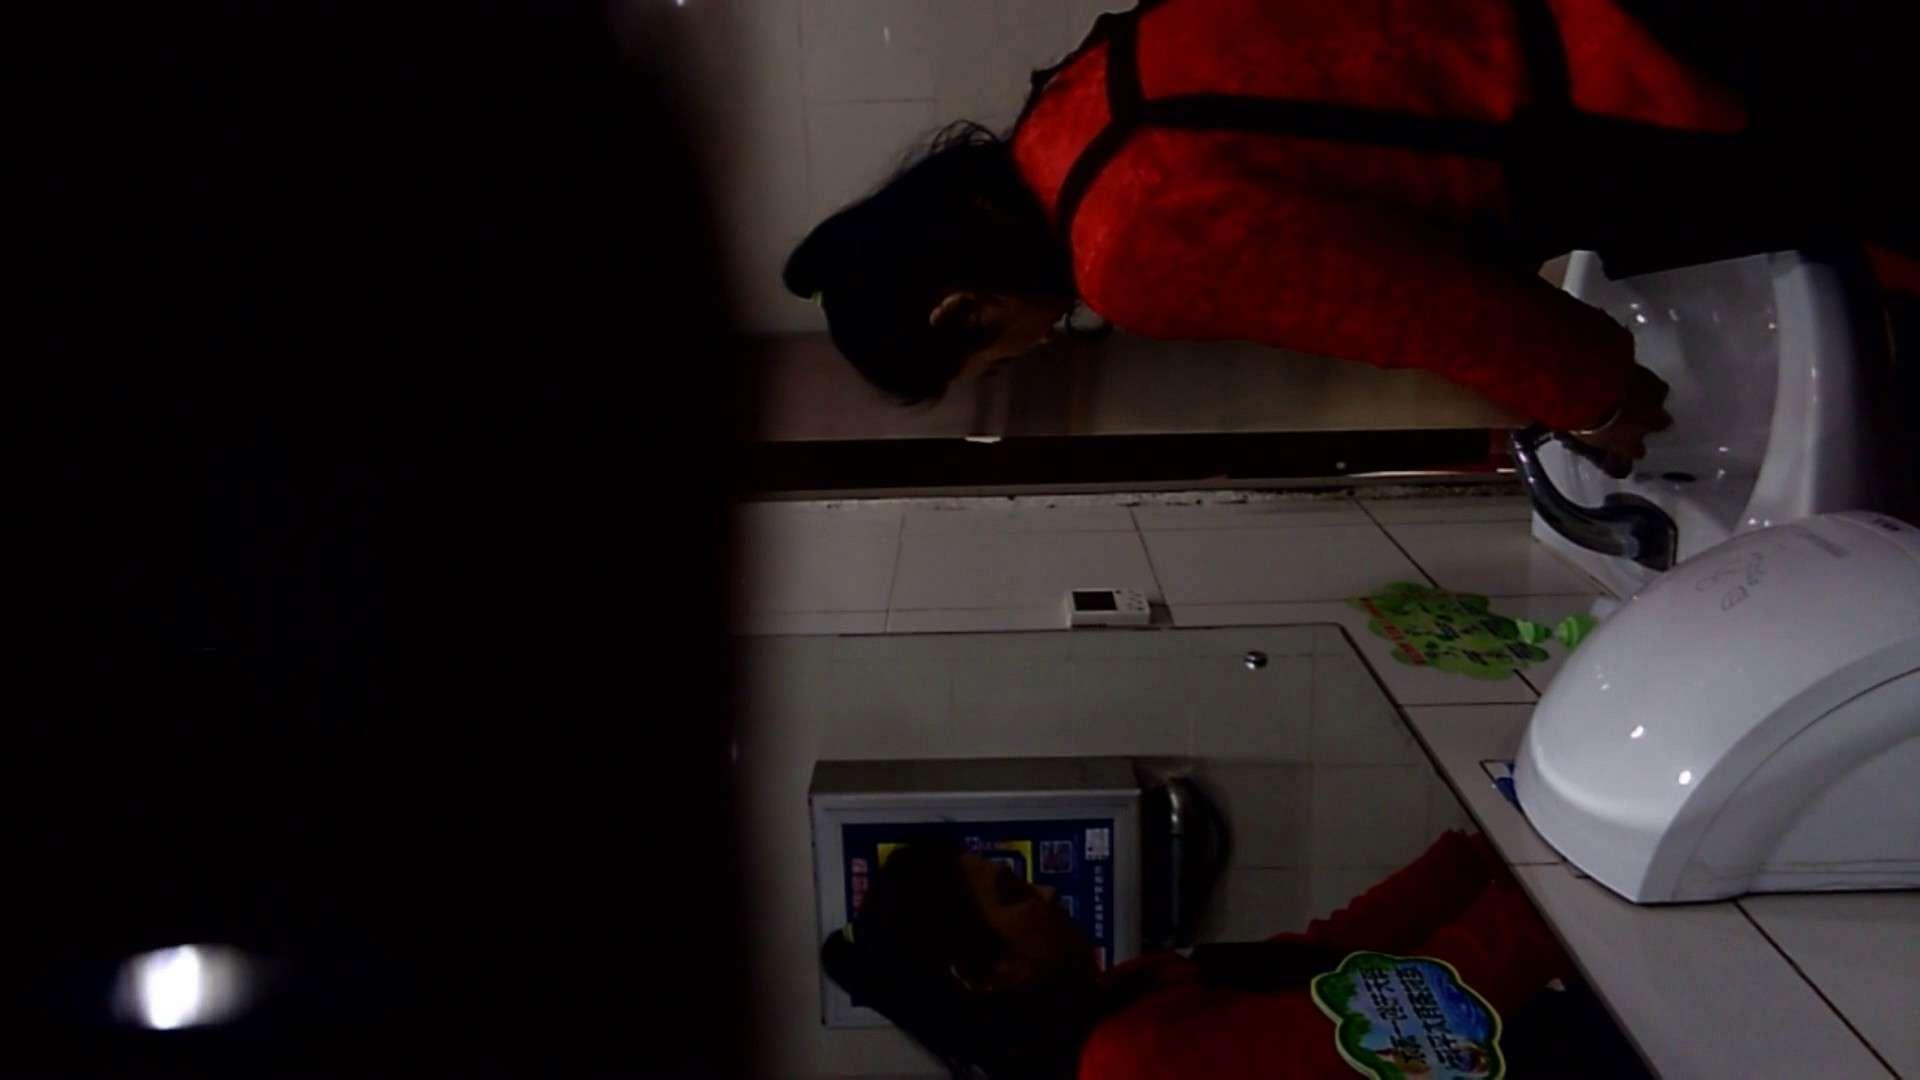 芸術大学ガチ潜入盗撮 JD盗撮 美女の洗面所の秘密 Vol.105 丸見え  100PIX 90